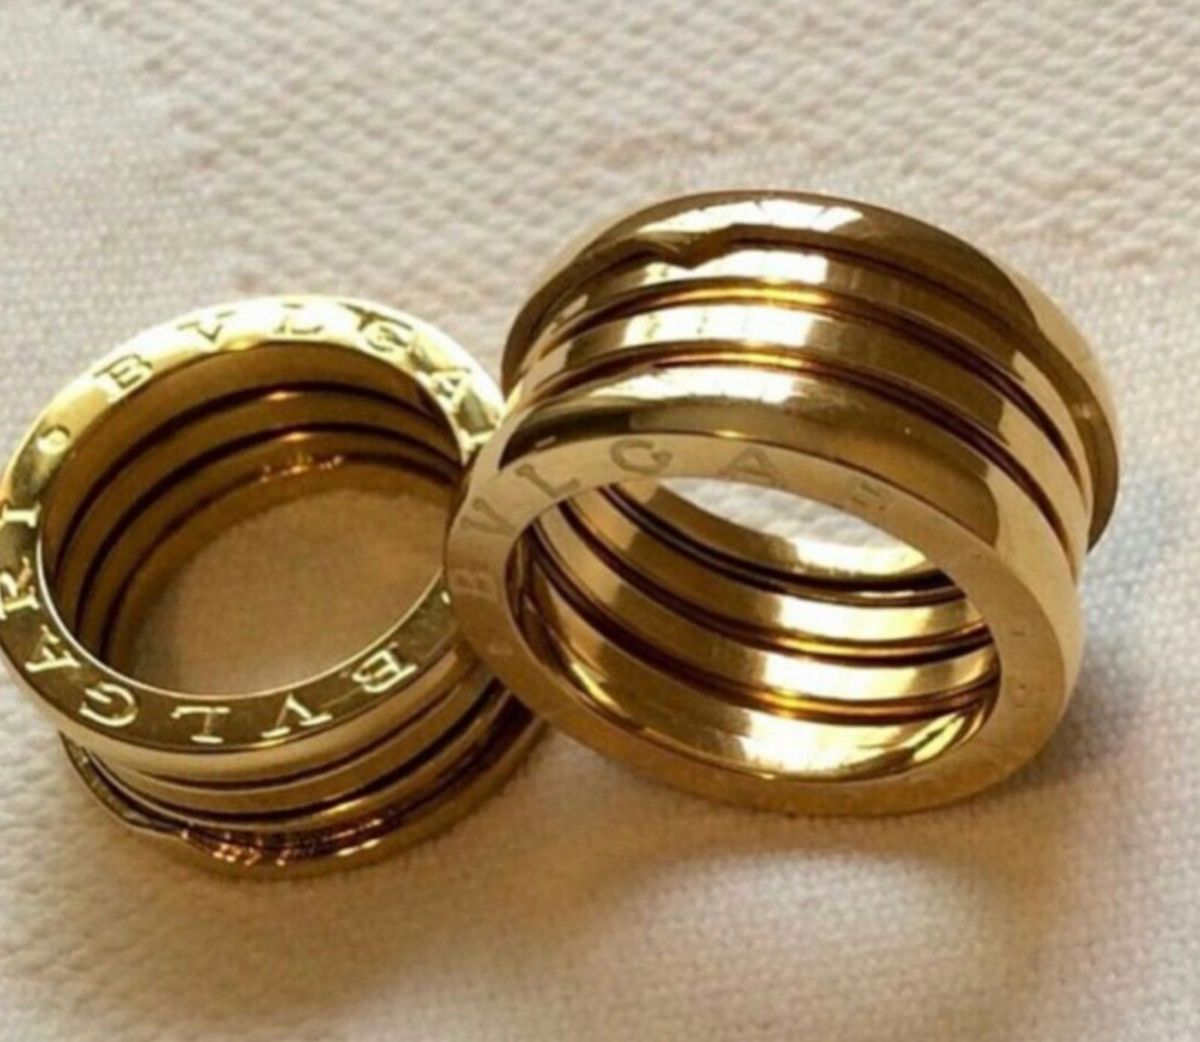 1a662d954f7 aliança de ouro 18k modelo bvlgari - jóias bvlgari